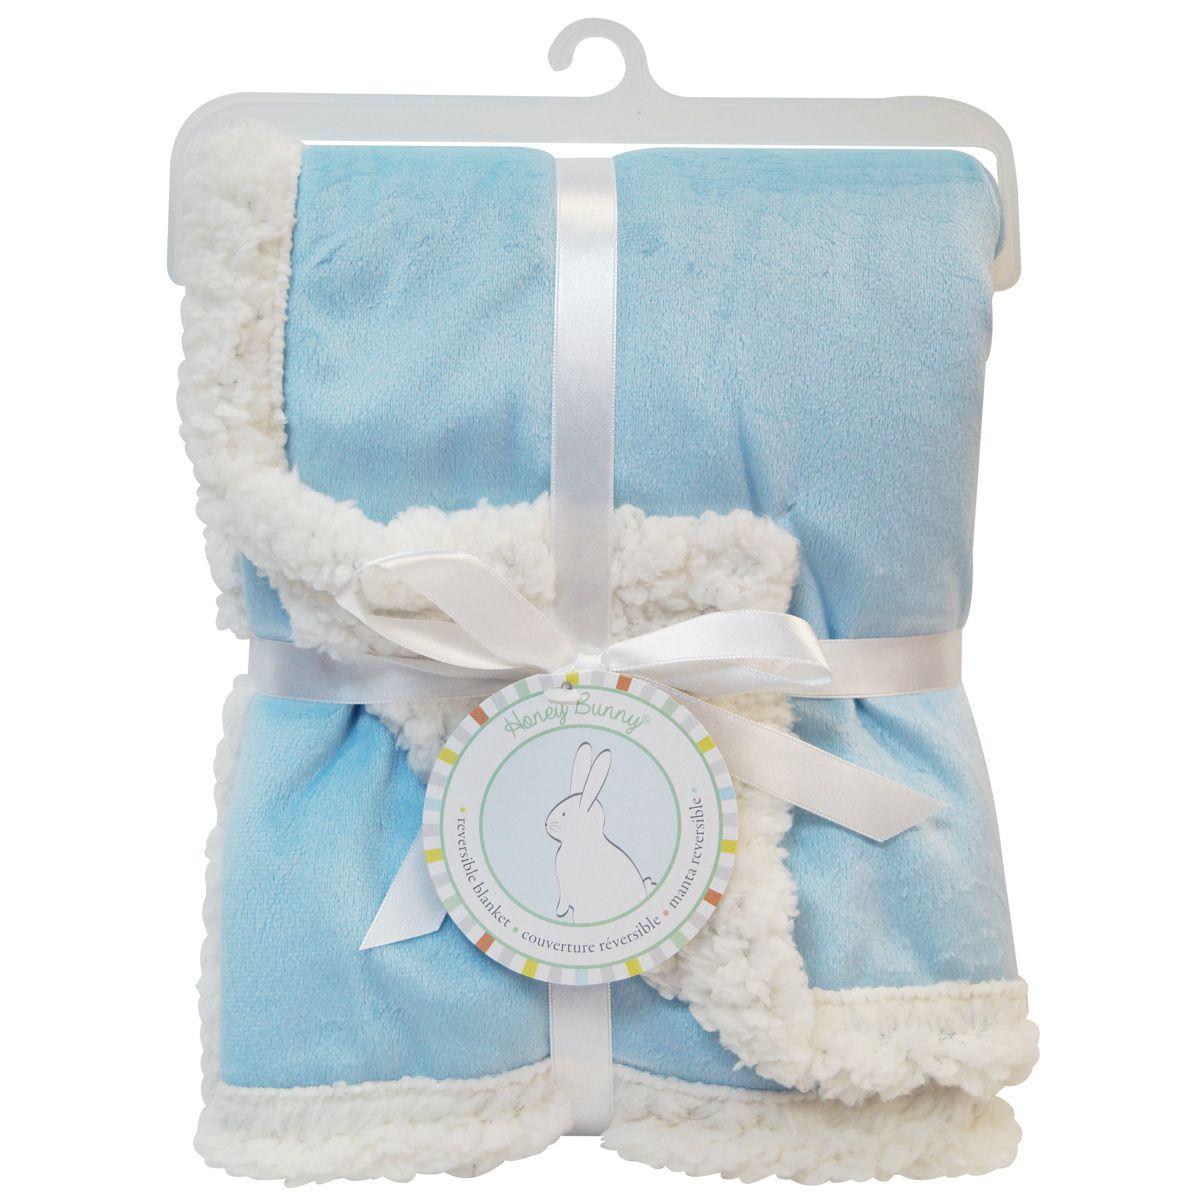 Manta de Microfibra Honey Bunny Dupla Face Azul para bebê